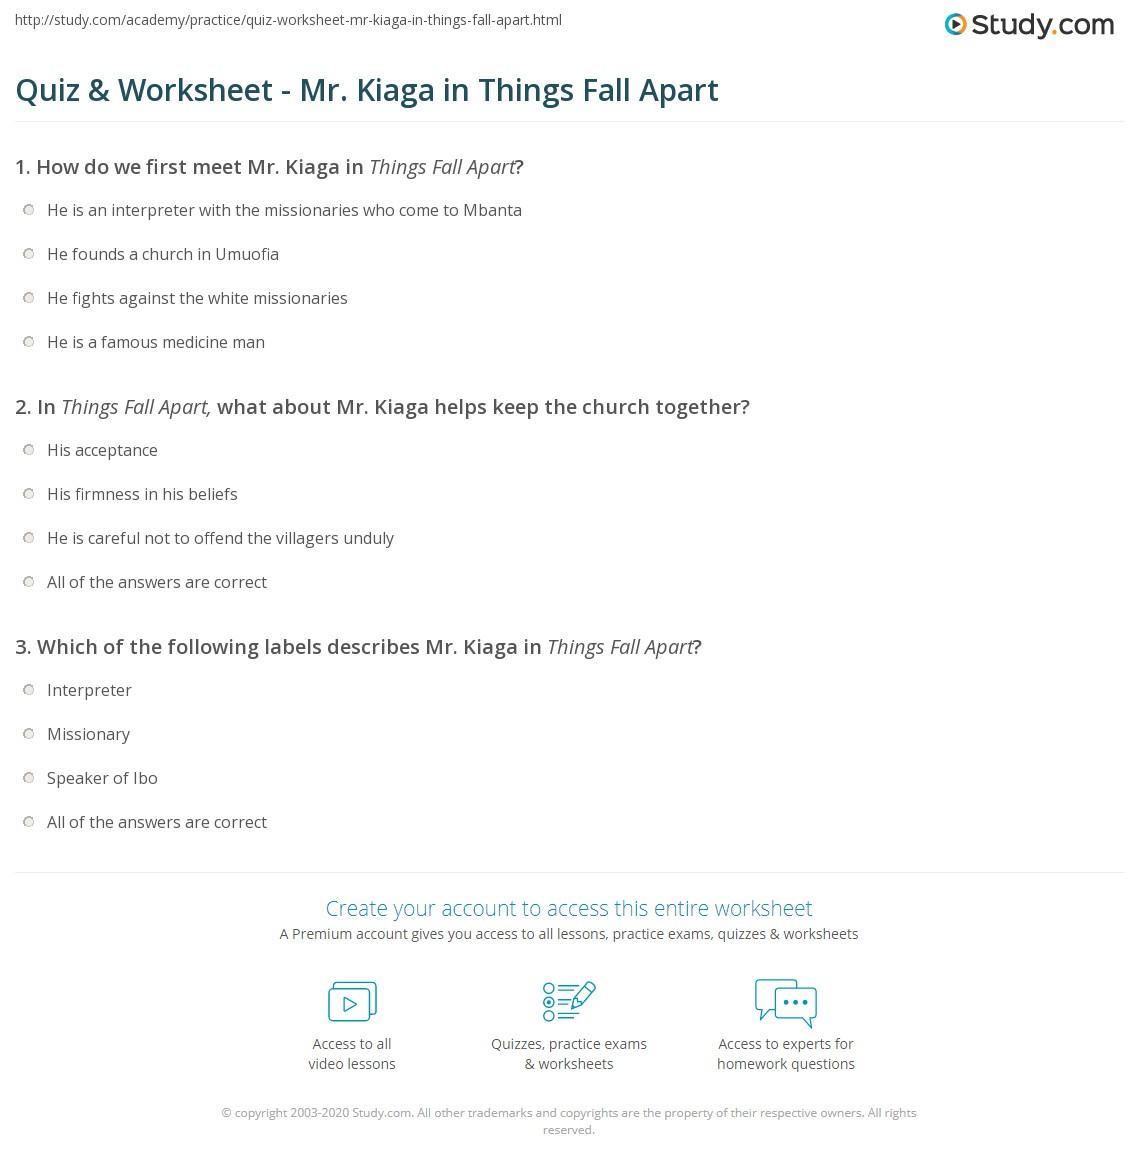 Quiz & Worksheet - Mr. Kiaga In Things Fall Apart